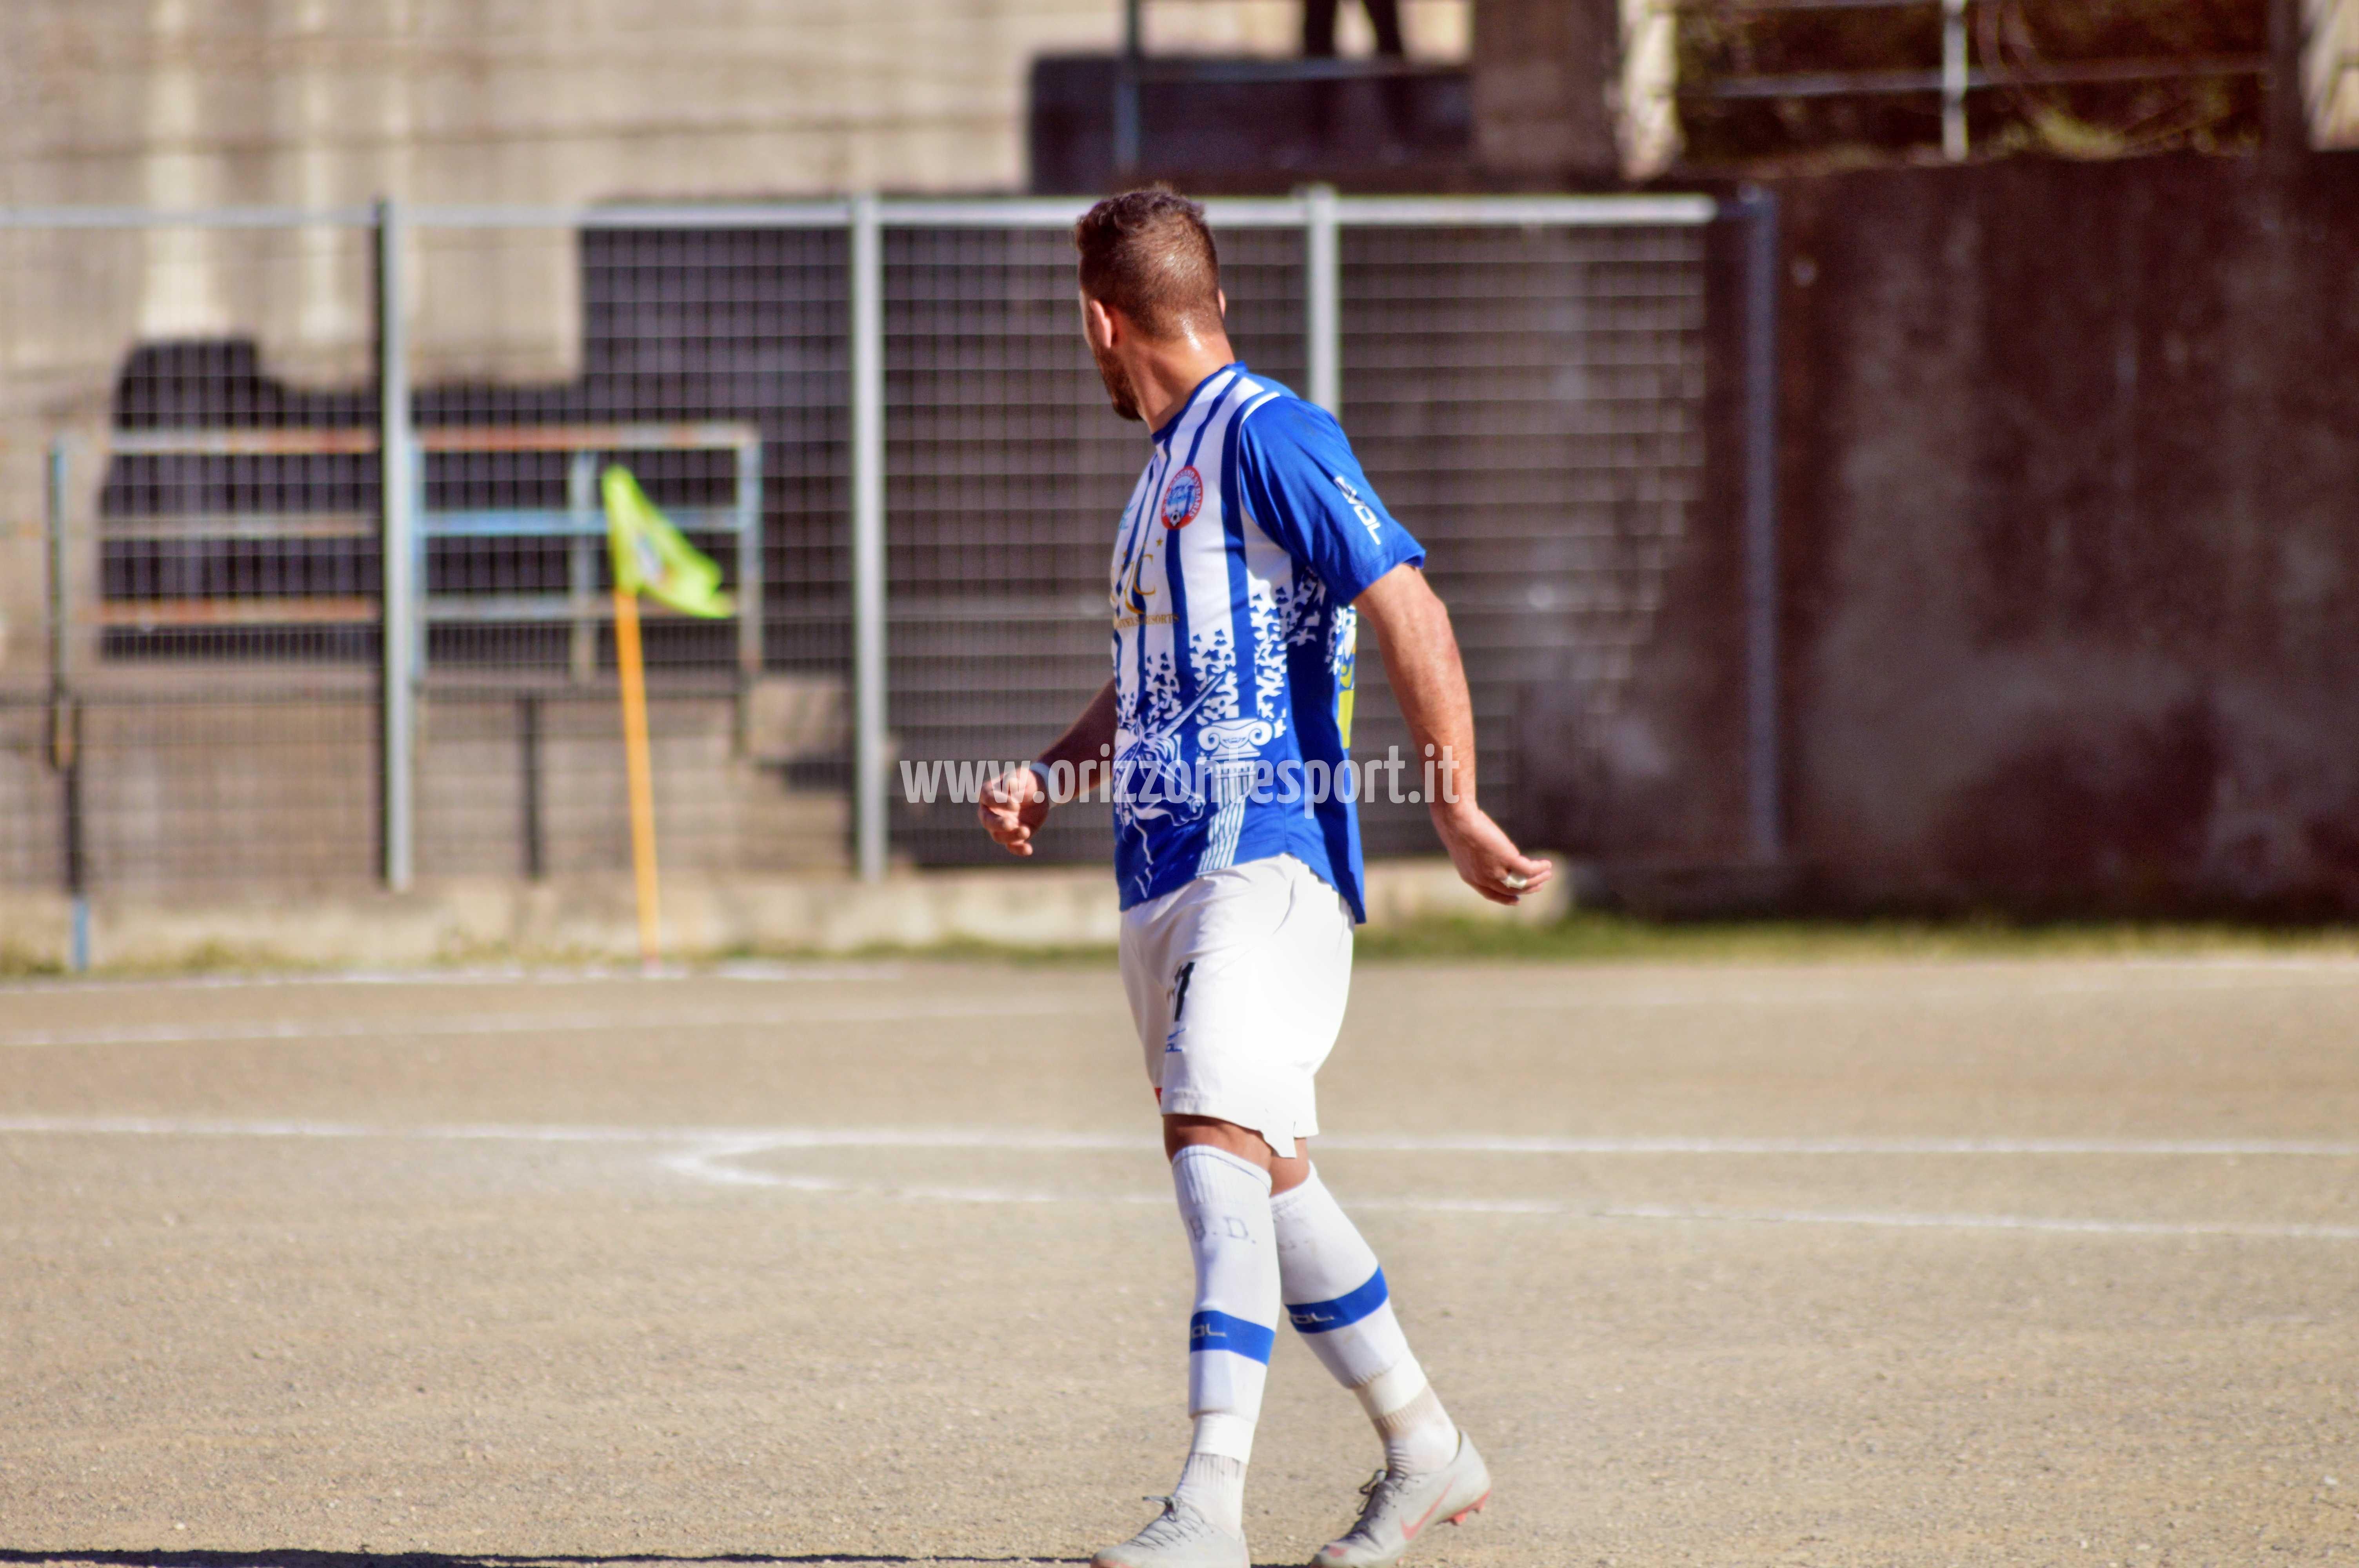 cassano_rossanese (86)